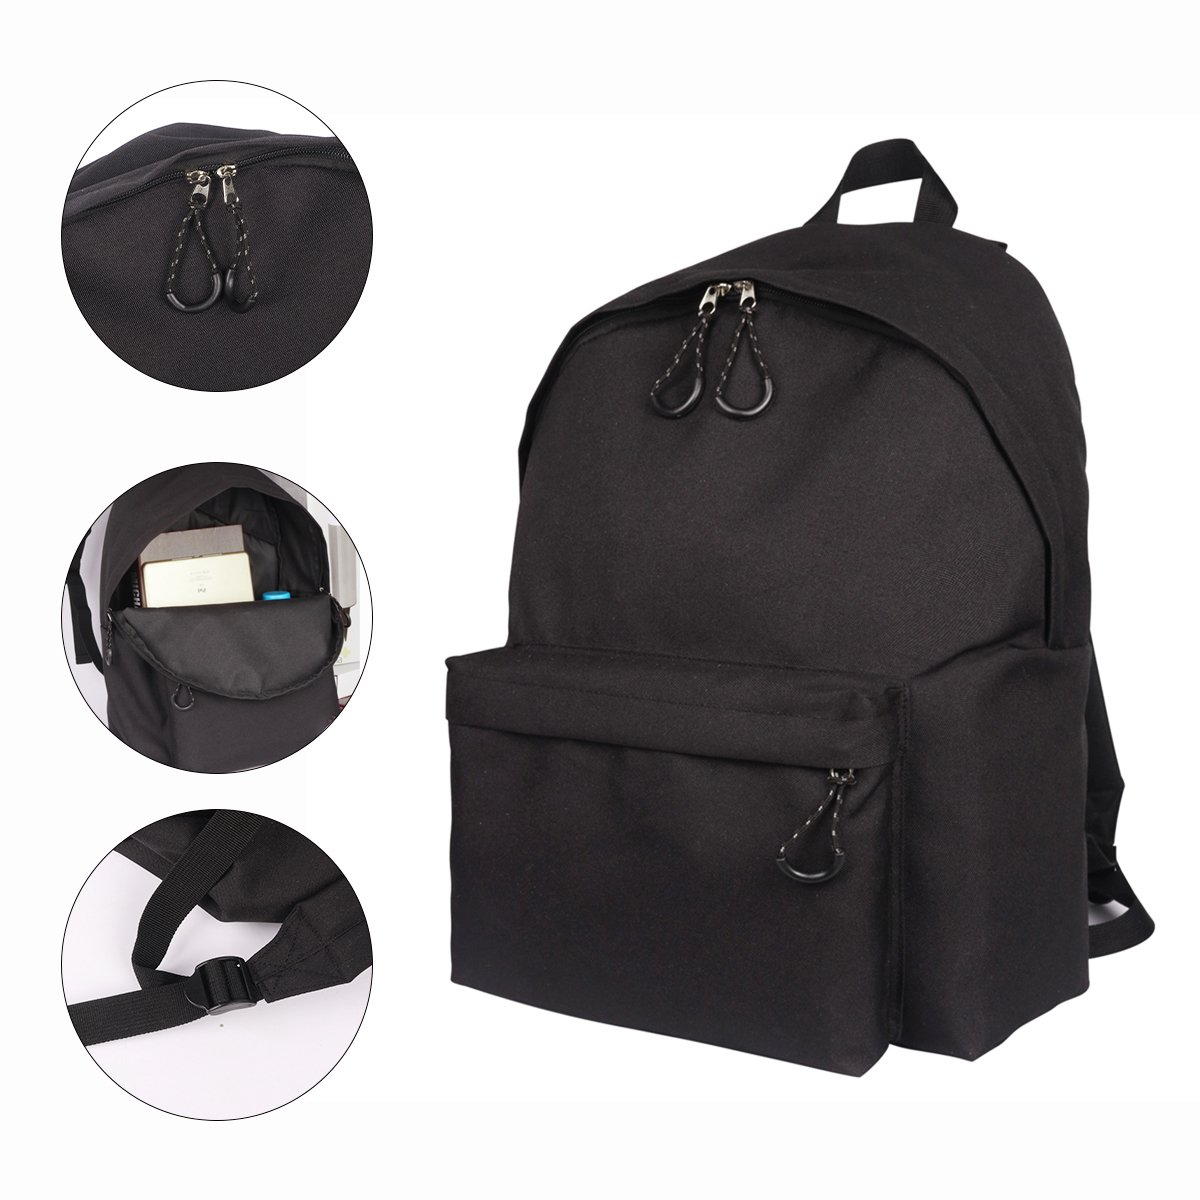 e6eb62bedd5 Amazon.com  ThiKin Lightweight Backpack Boys   Girls Junior High School  Bags Student Bookbags (TK25-Black-1)  YOUNGERBABY